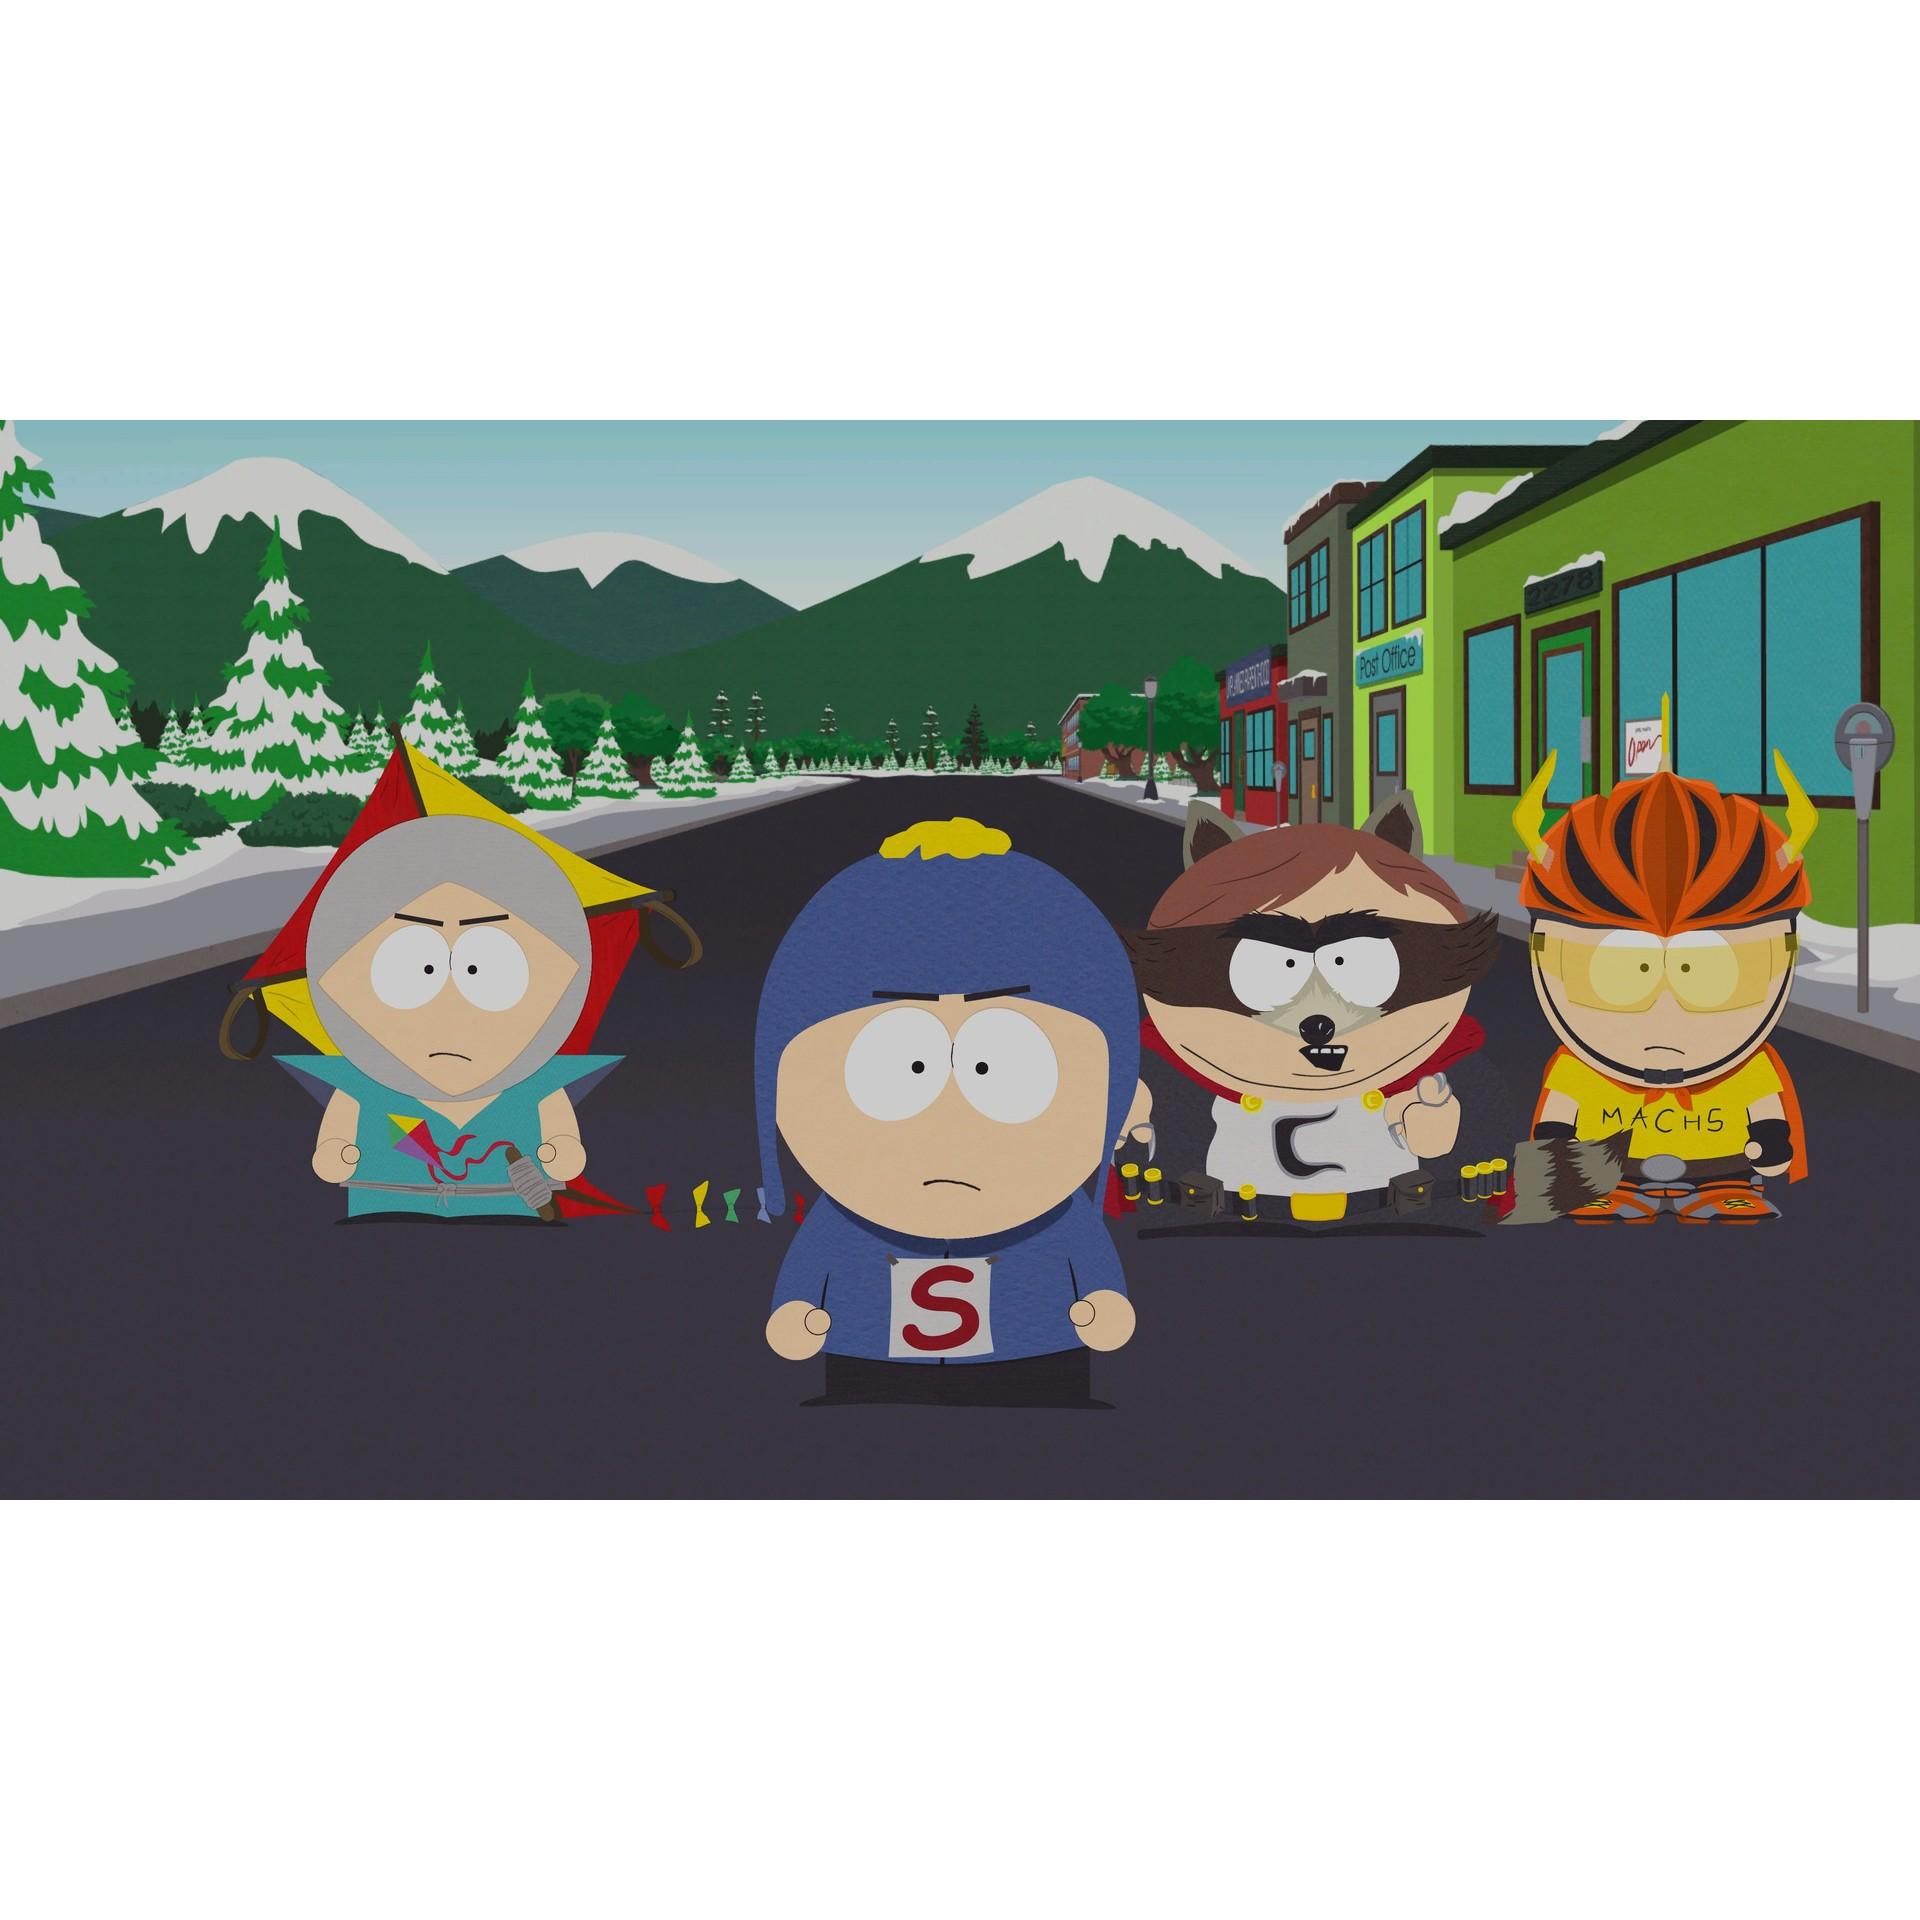 Joc South Park The Fractured But Whole pentru Xbox One 5